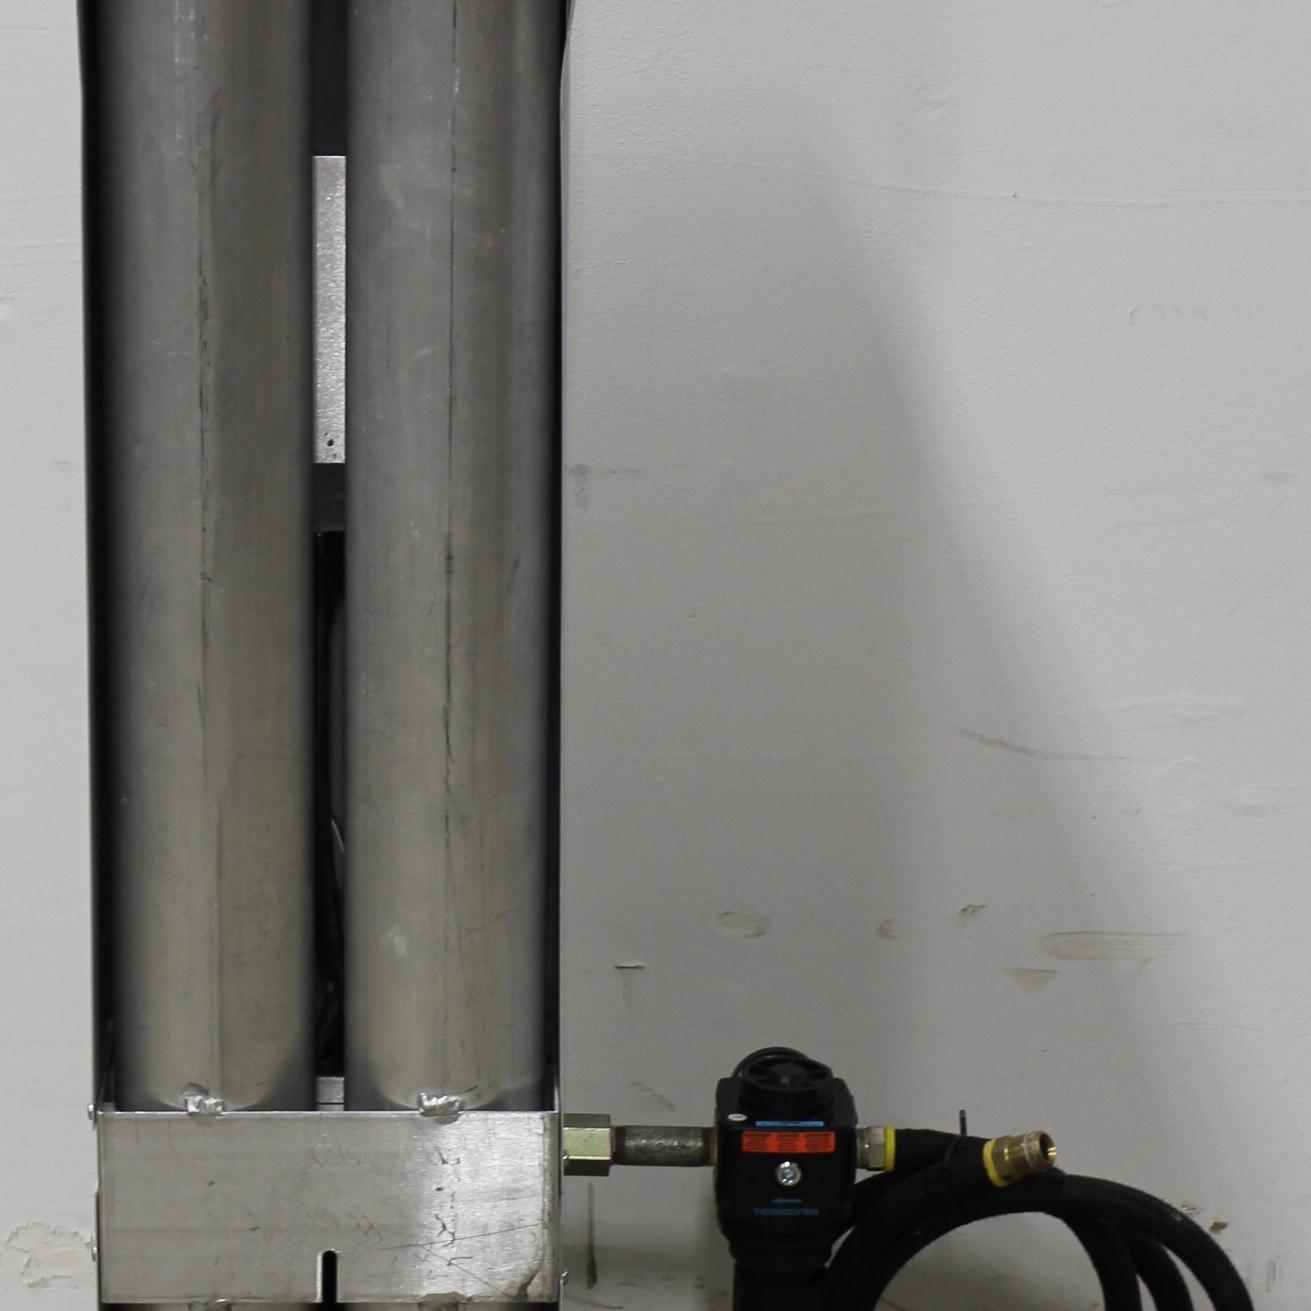 Parker Balston FT-IR Purge Gas Generator Image